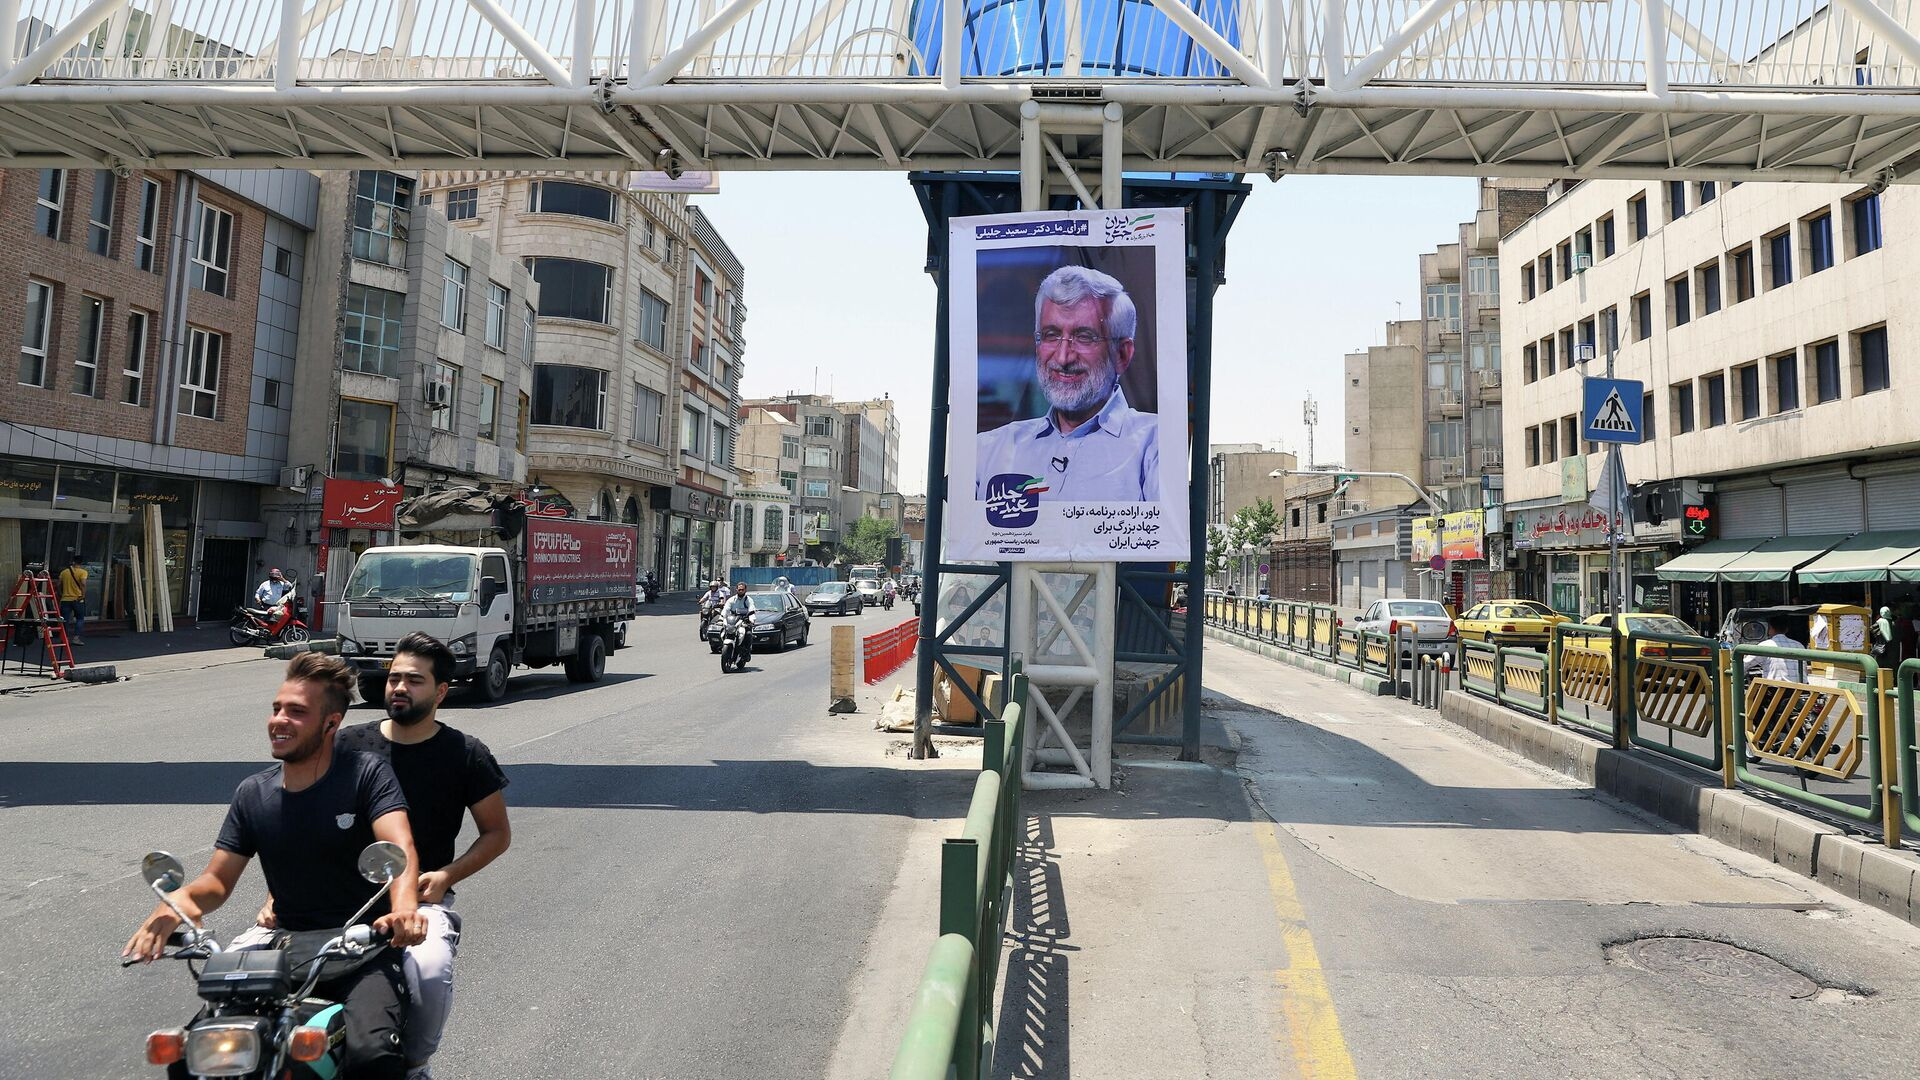 Роухани поздравил Ибрахима Раиси с победой на президентских выборах